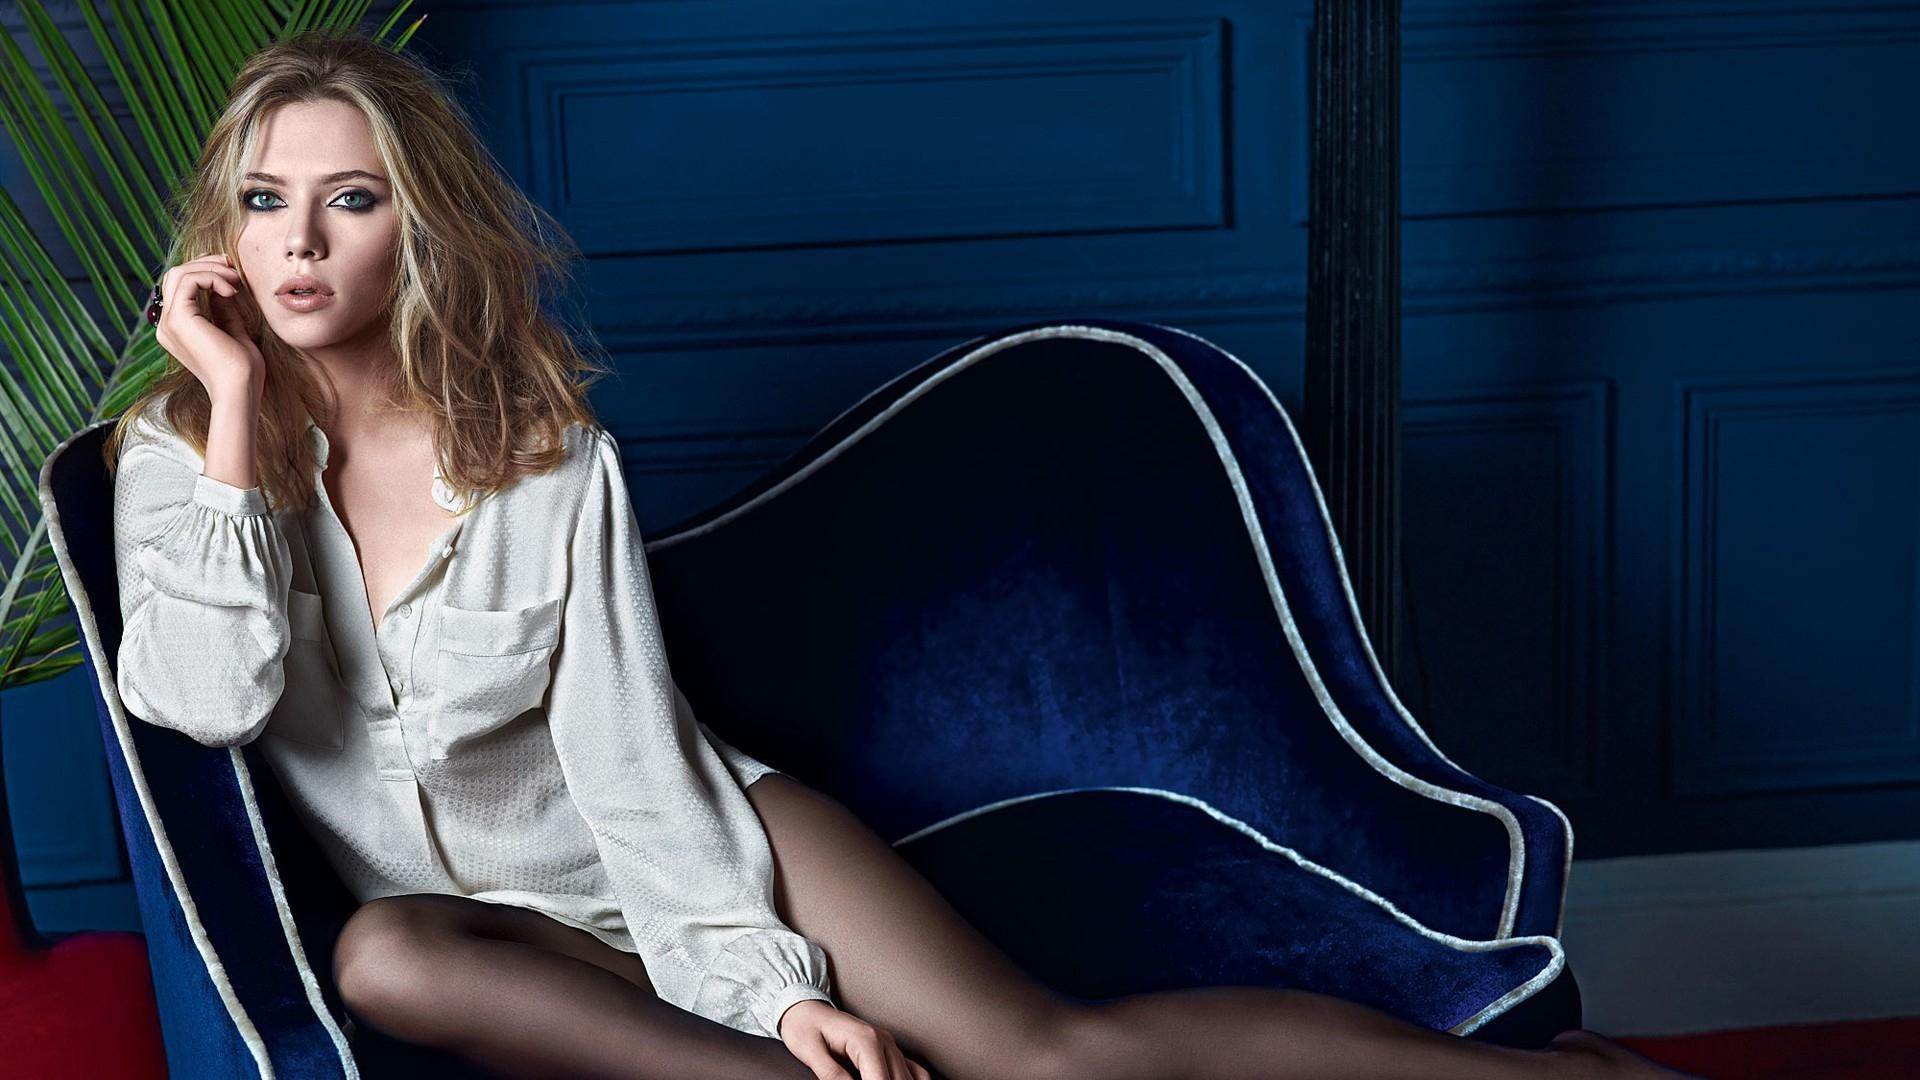 Nice Scarlett Johansson 1920x1080 | Magicwallpapers.net